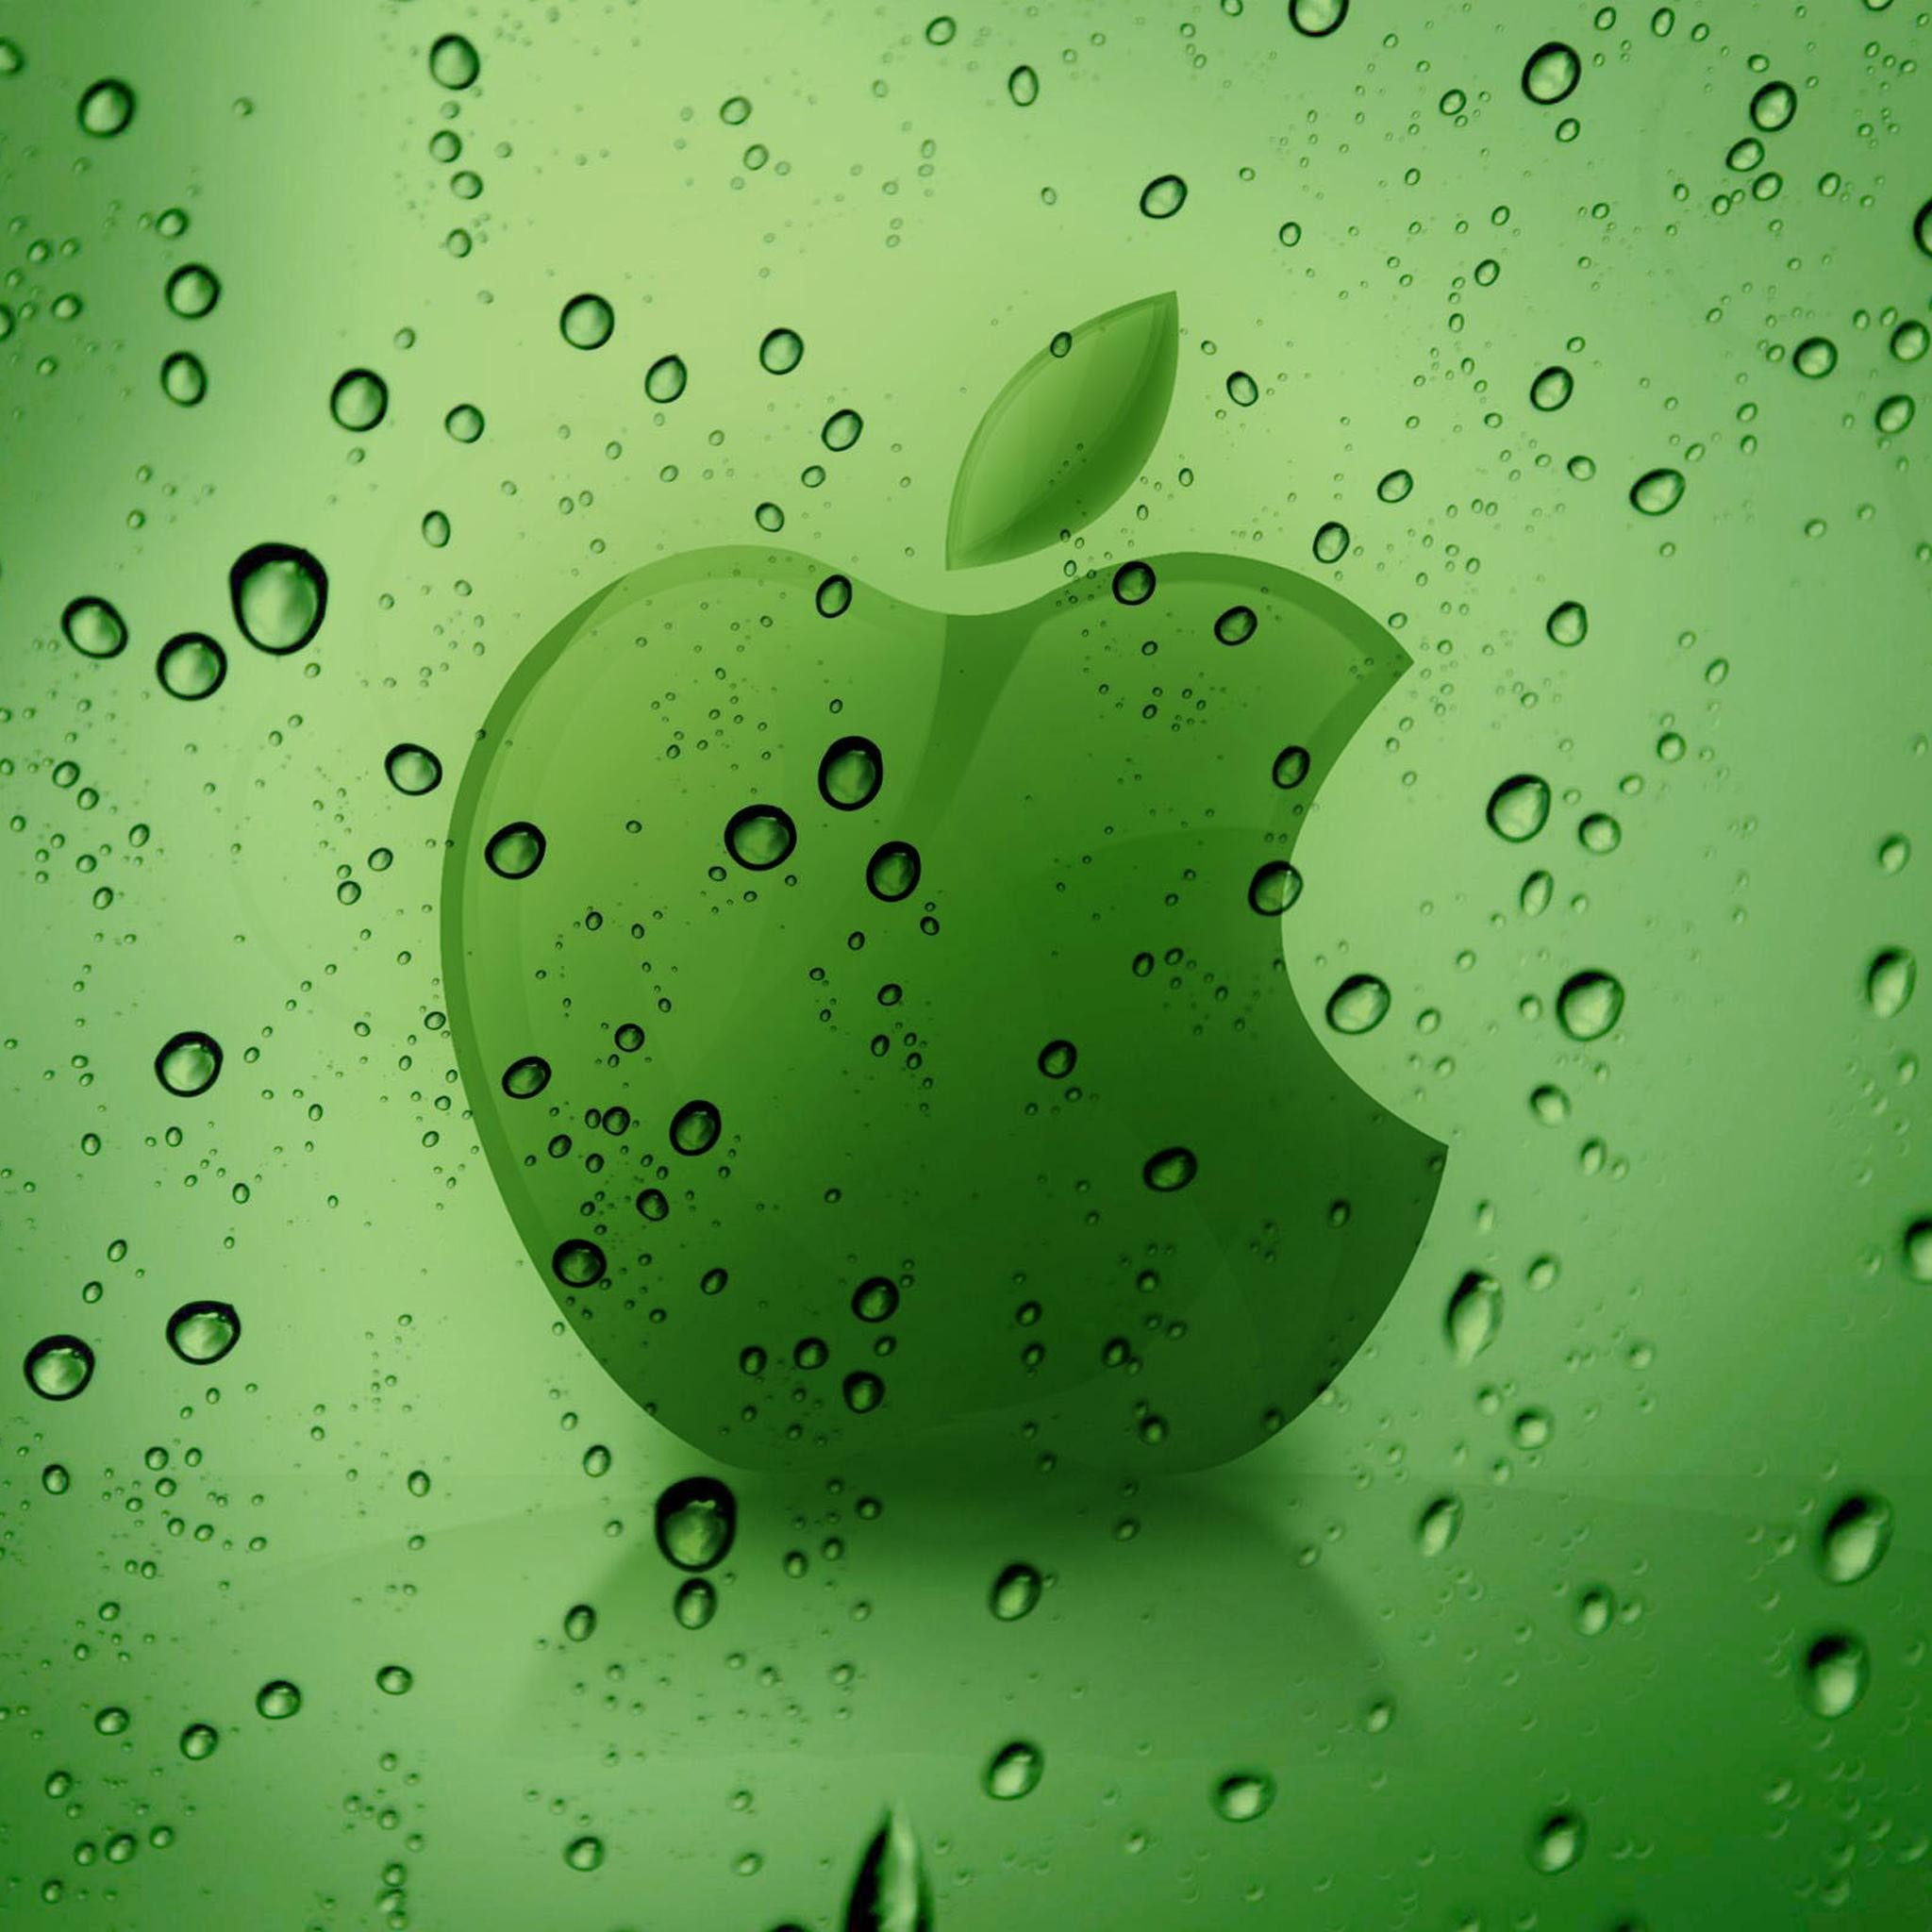 Apple Water Wallpaper 73 Pictures